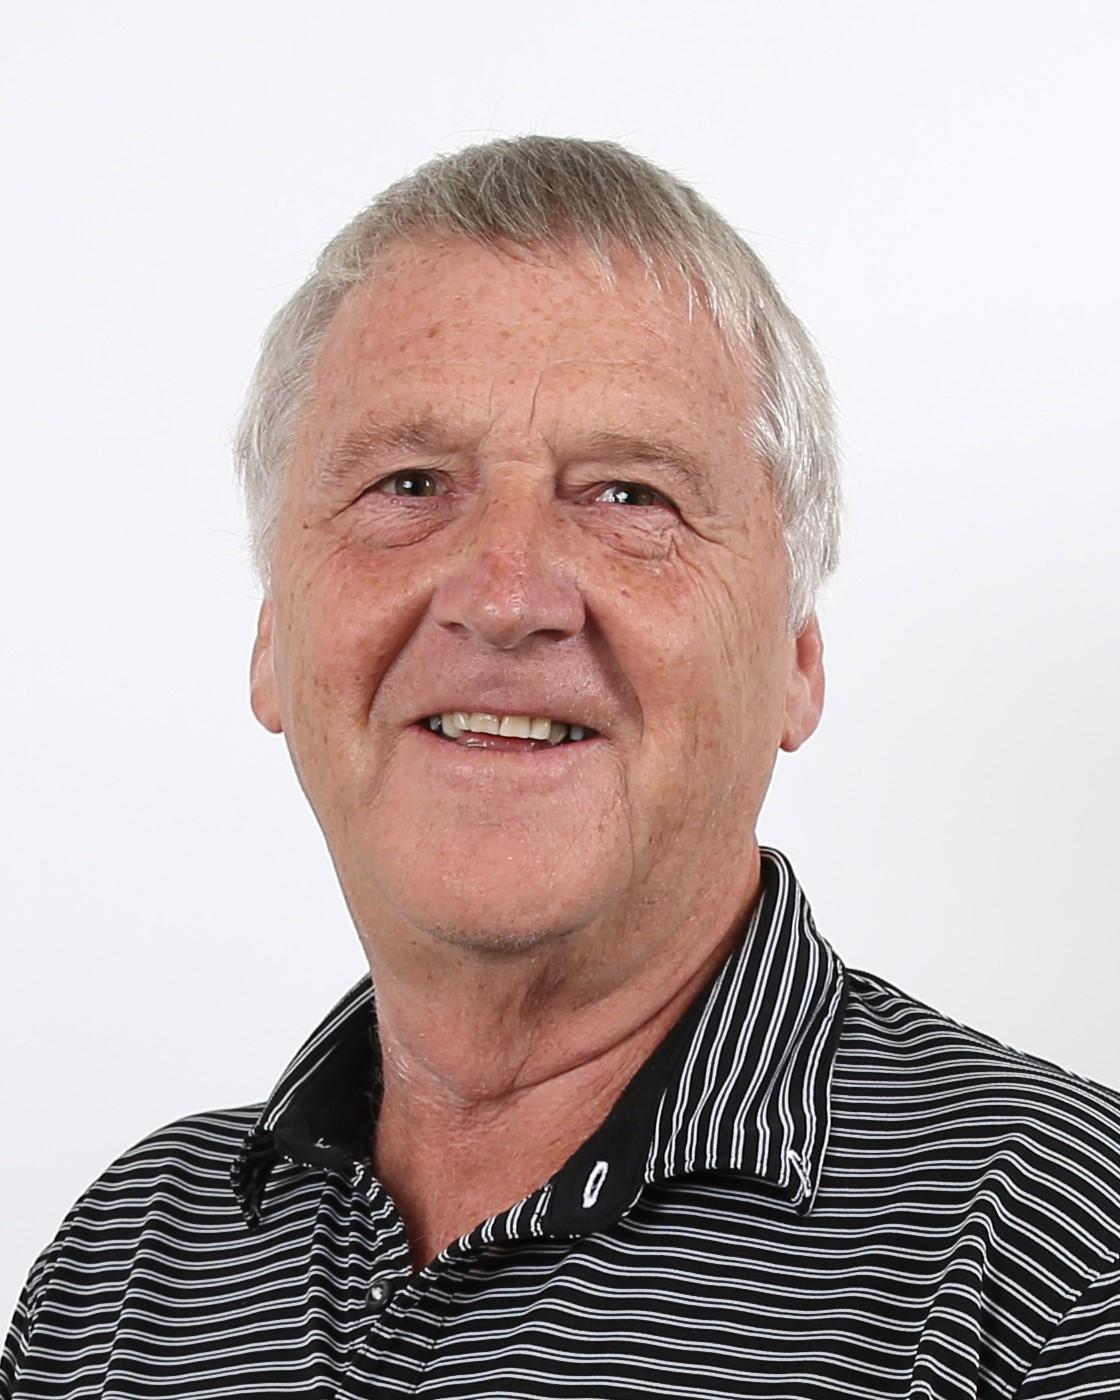 Neil McLaughlin